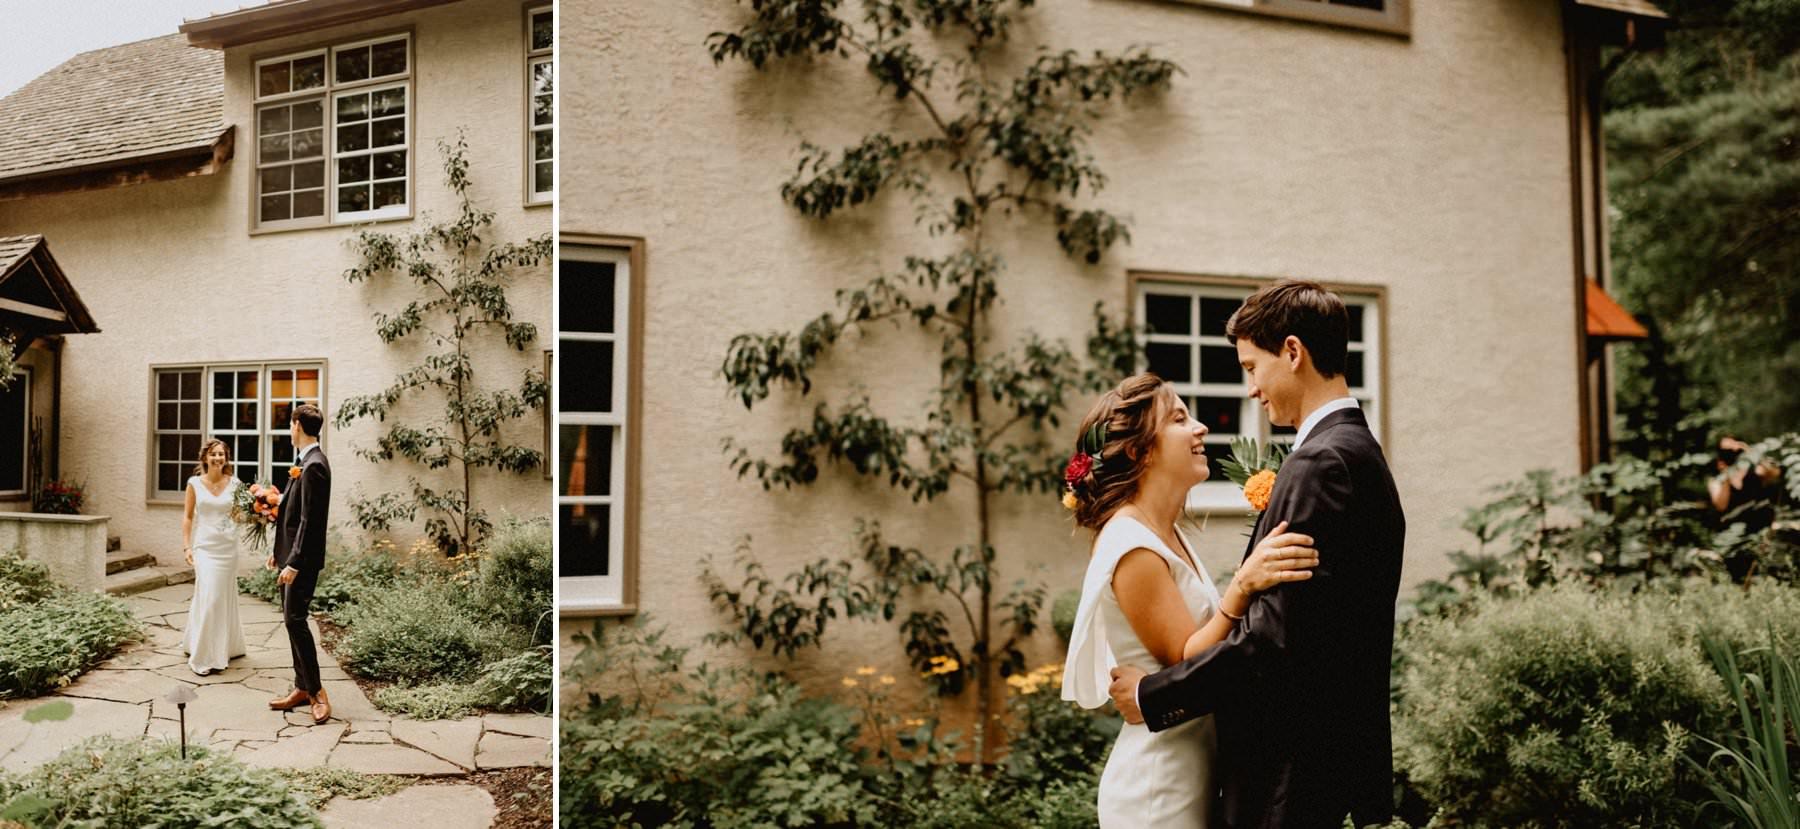 pennsylvania-private-estate-wedding-28.jpg